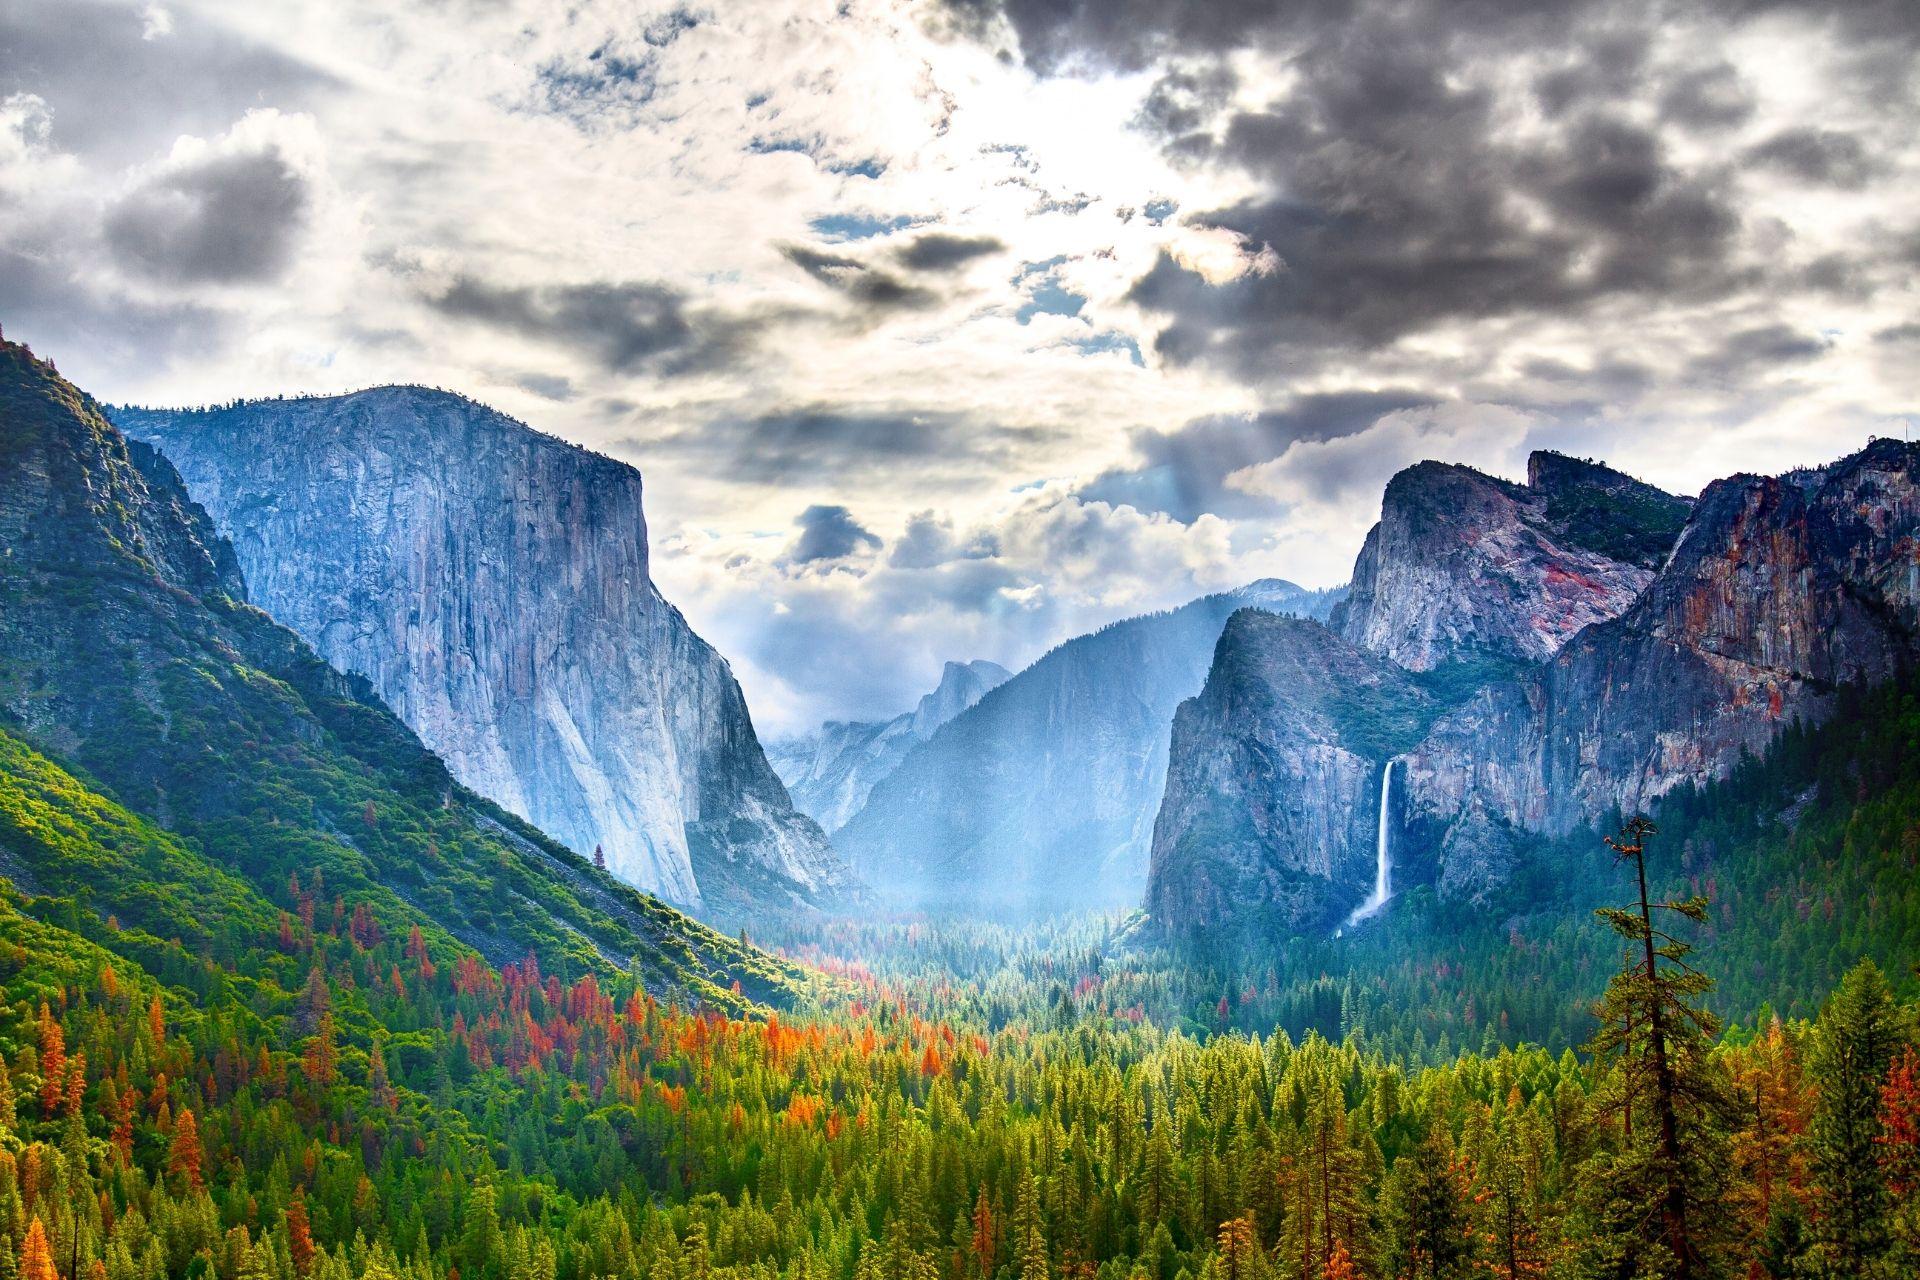 Best Hotels for Yosemite National Park